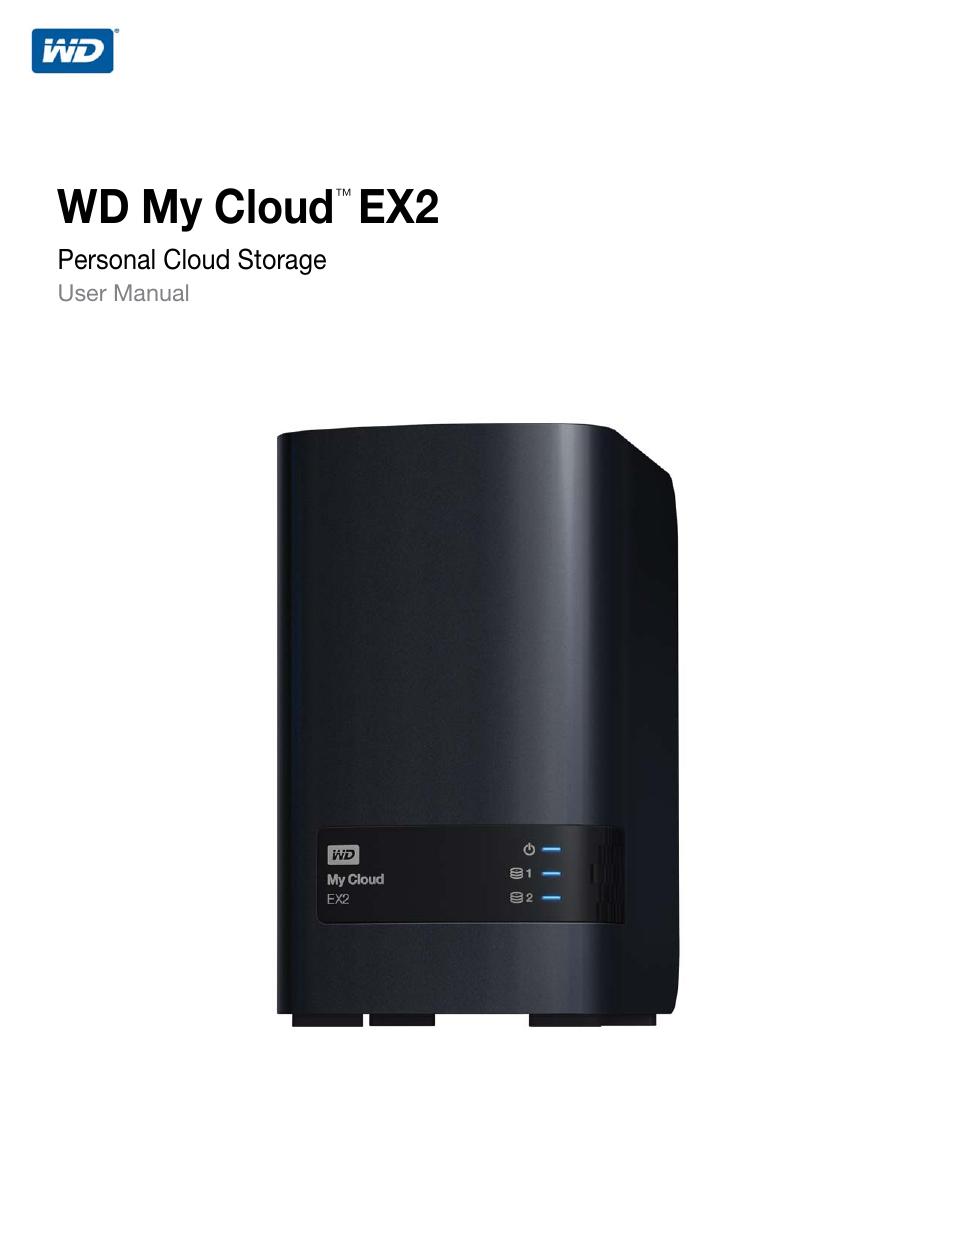 wd my cloud setup guide